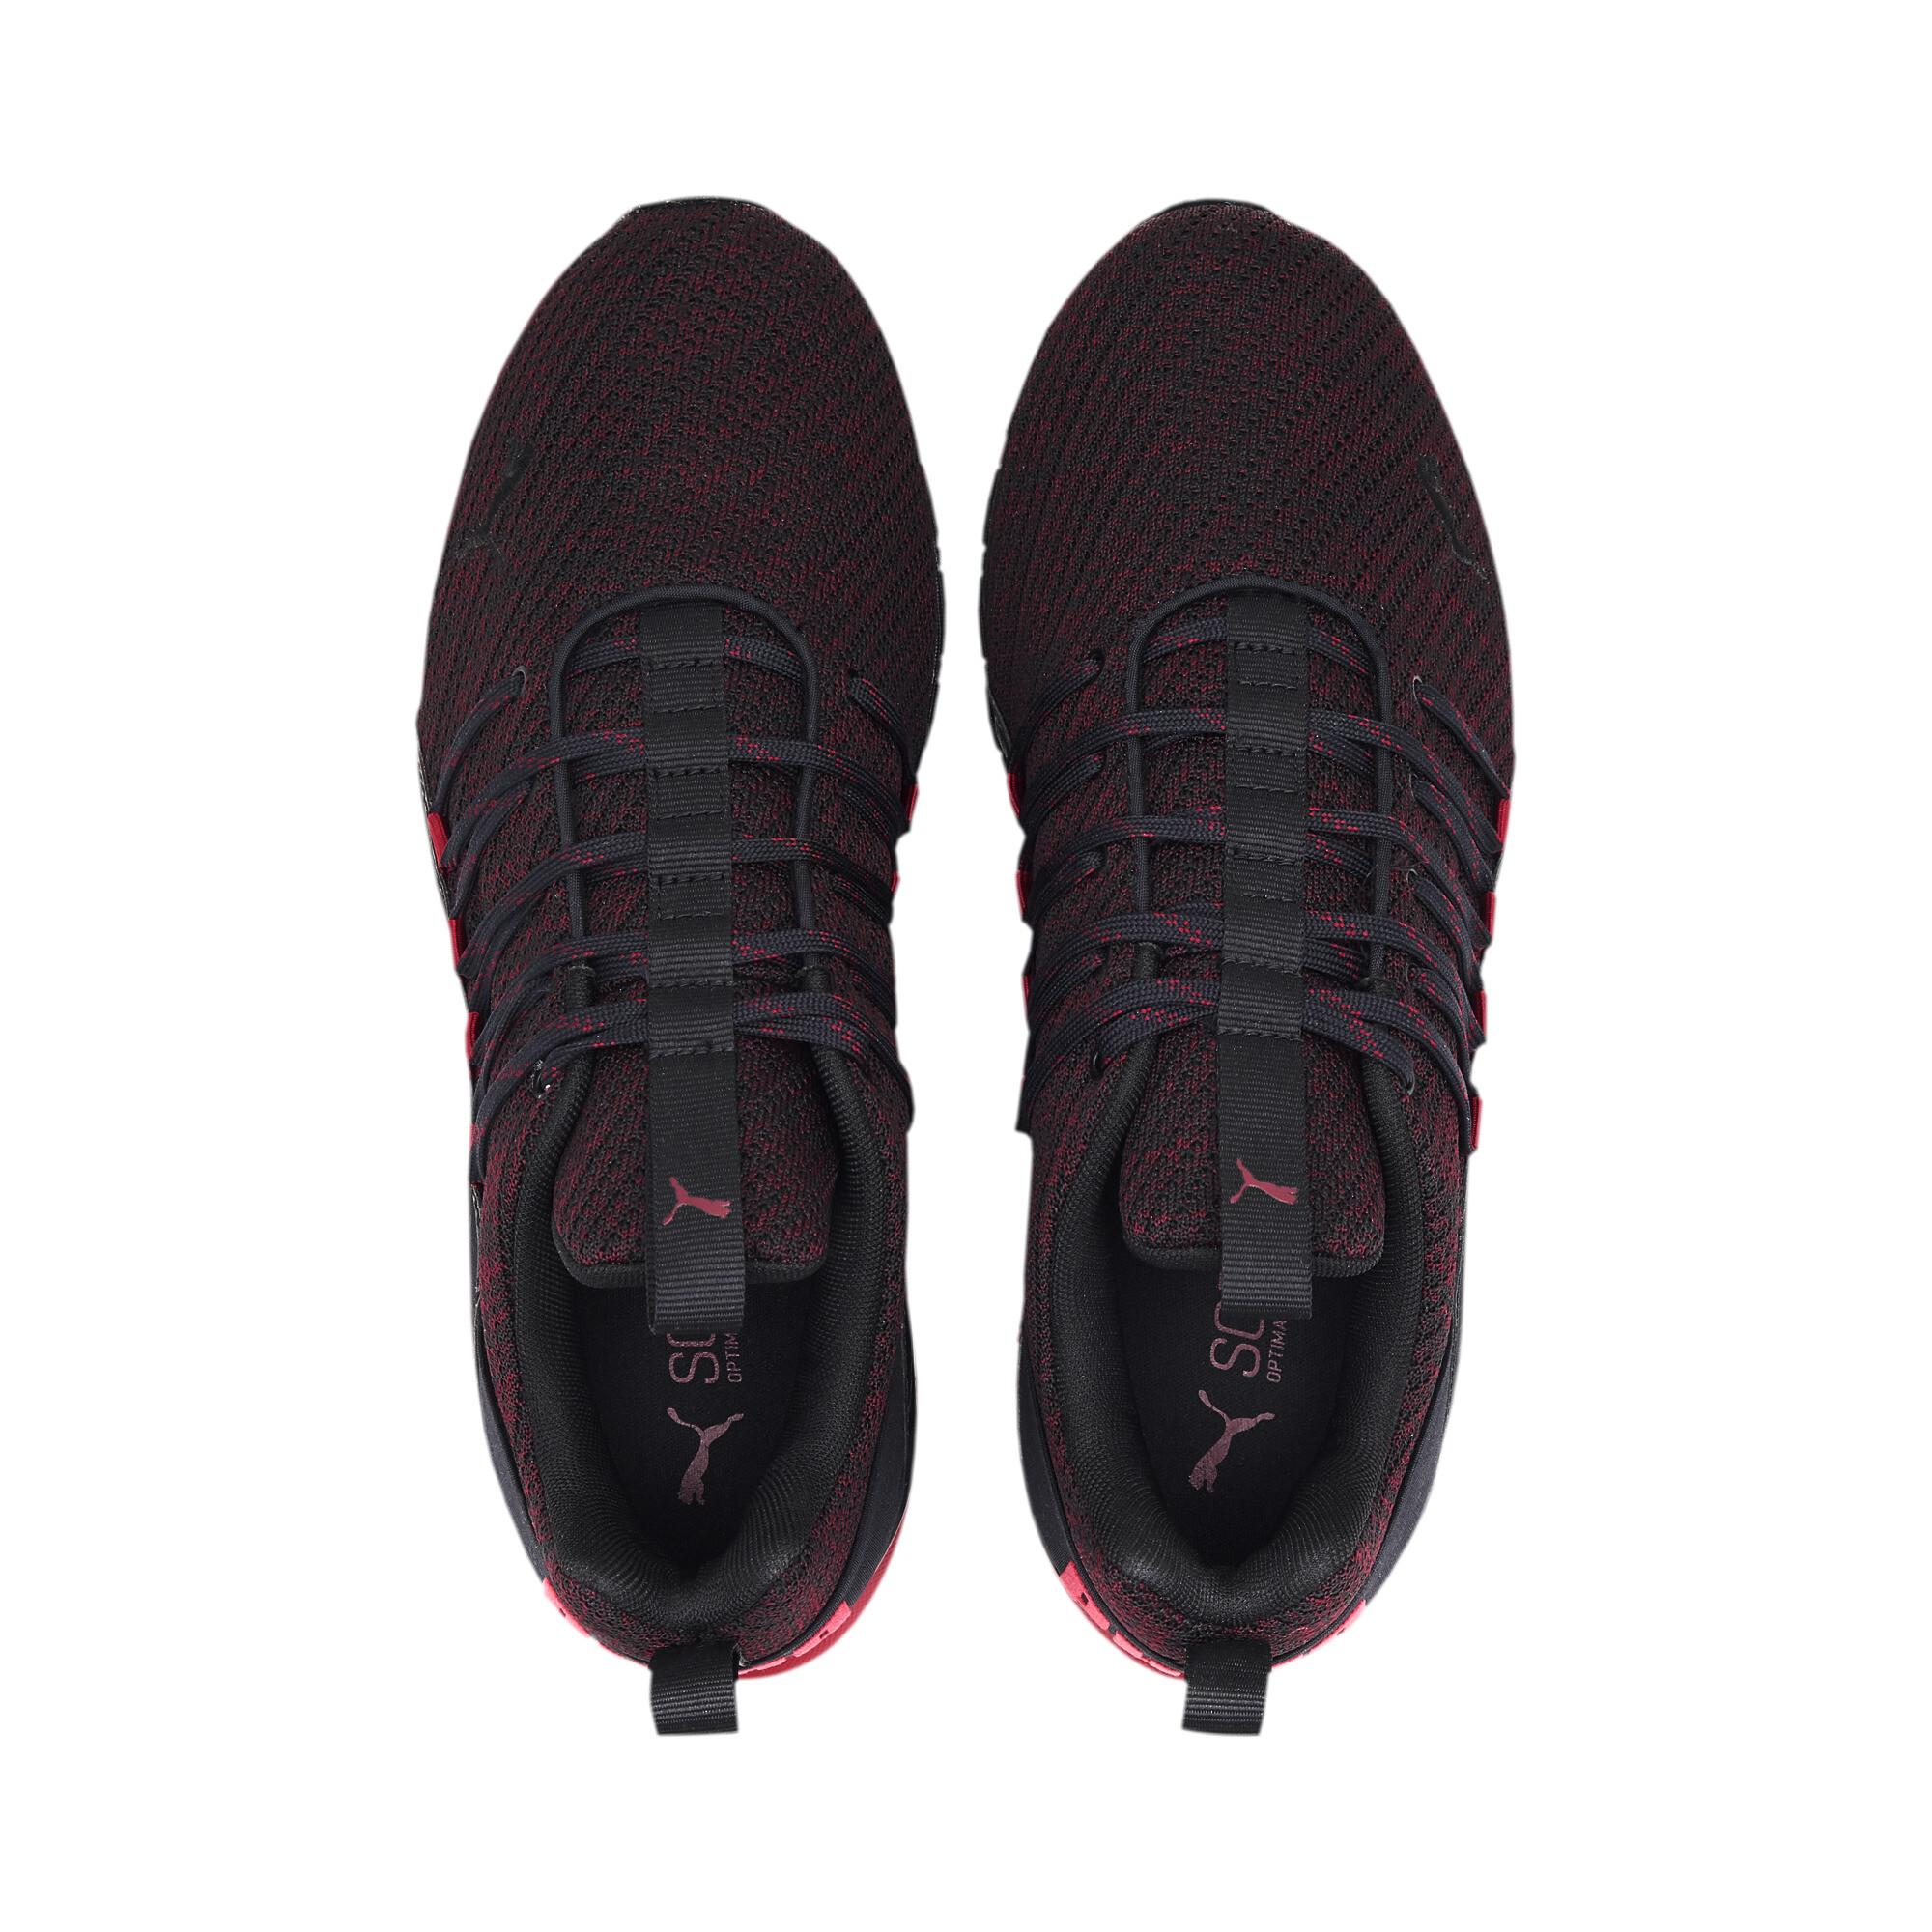 PUMA-Men-039-s-Axelion-Ultra-Running-Shoes thumbnail 15